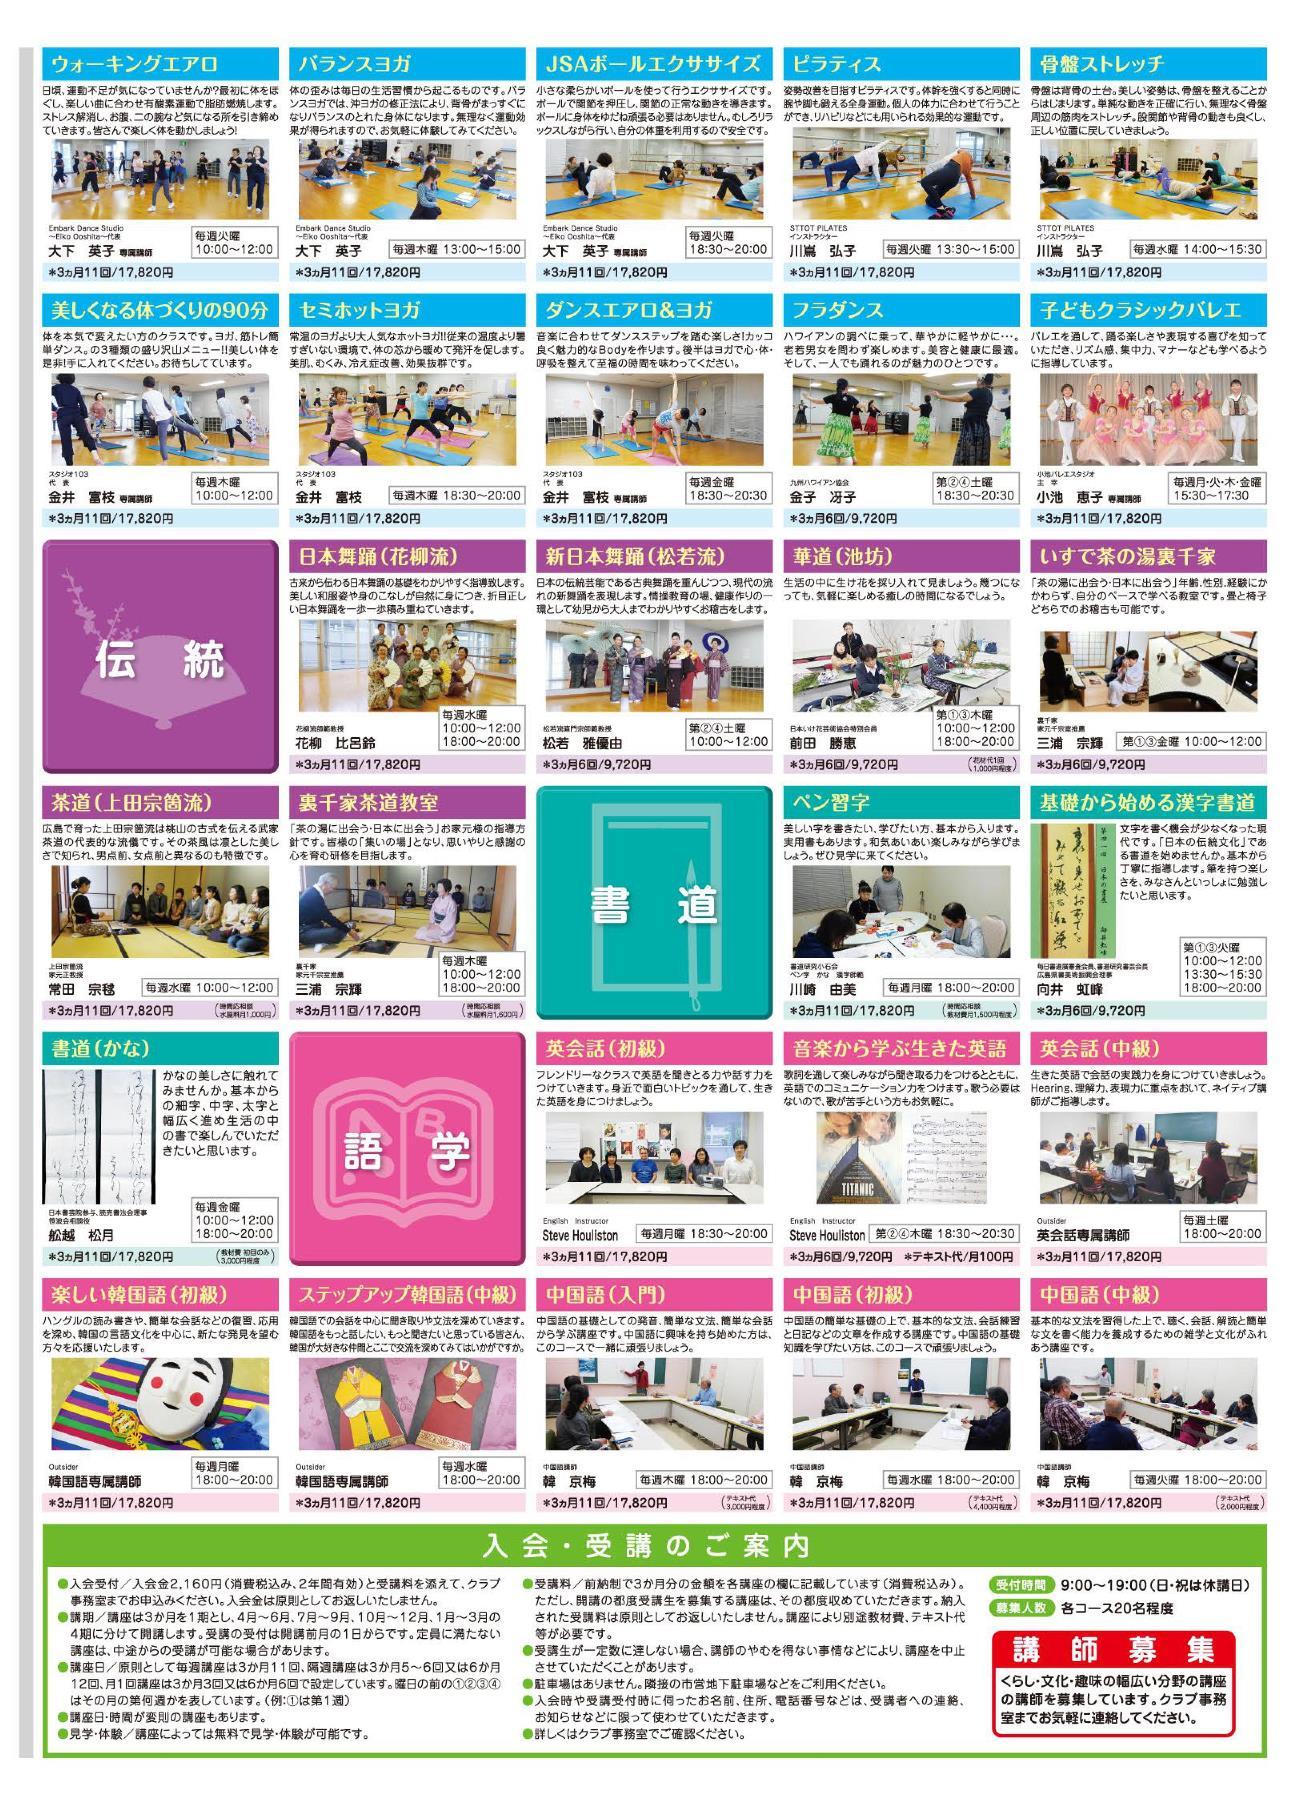 http://hiroshima-sunplaza.or.jp/blog/%E5%B9%B3%E6%88%9029%E5%B9%B4%E5%BA%A61%E6%9C%9F_3web.jpg